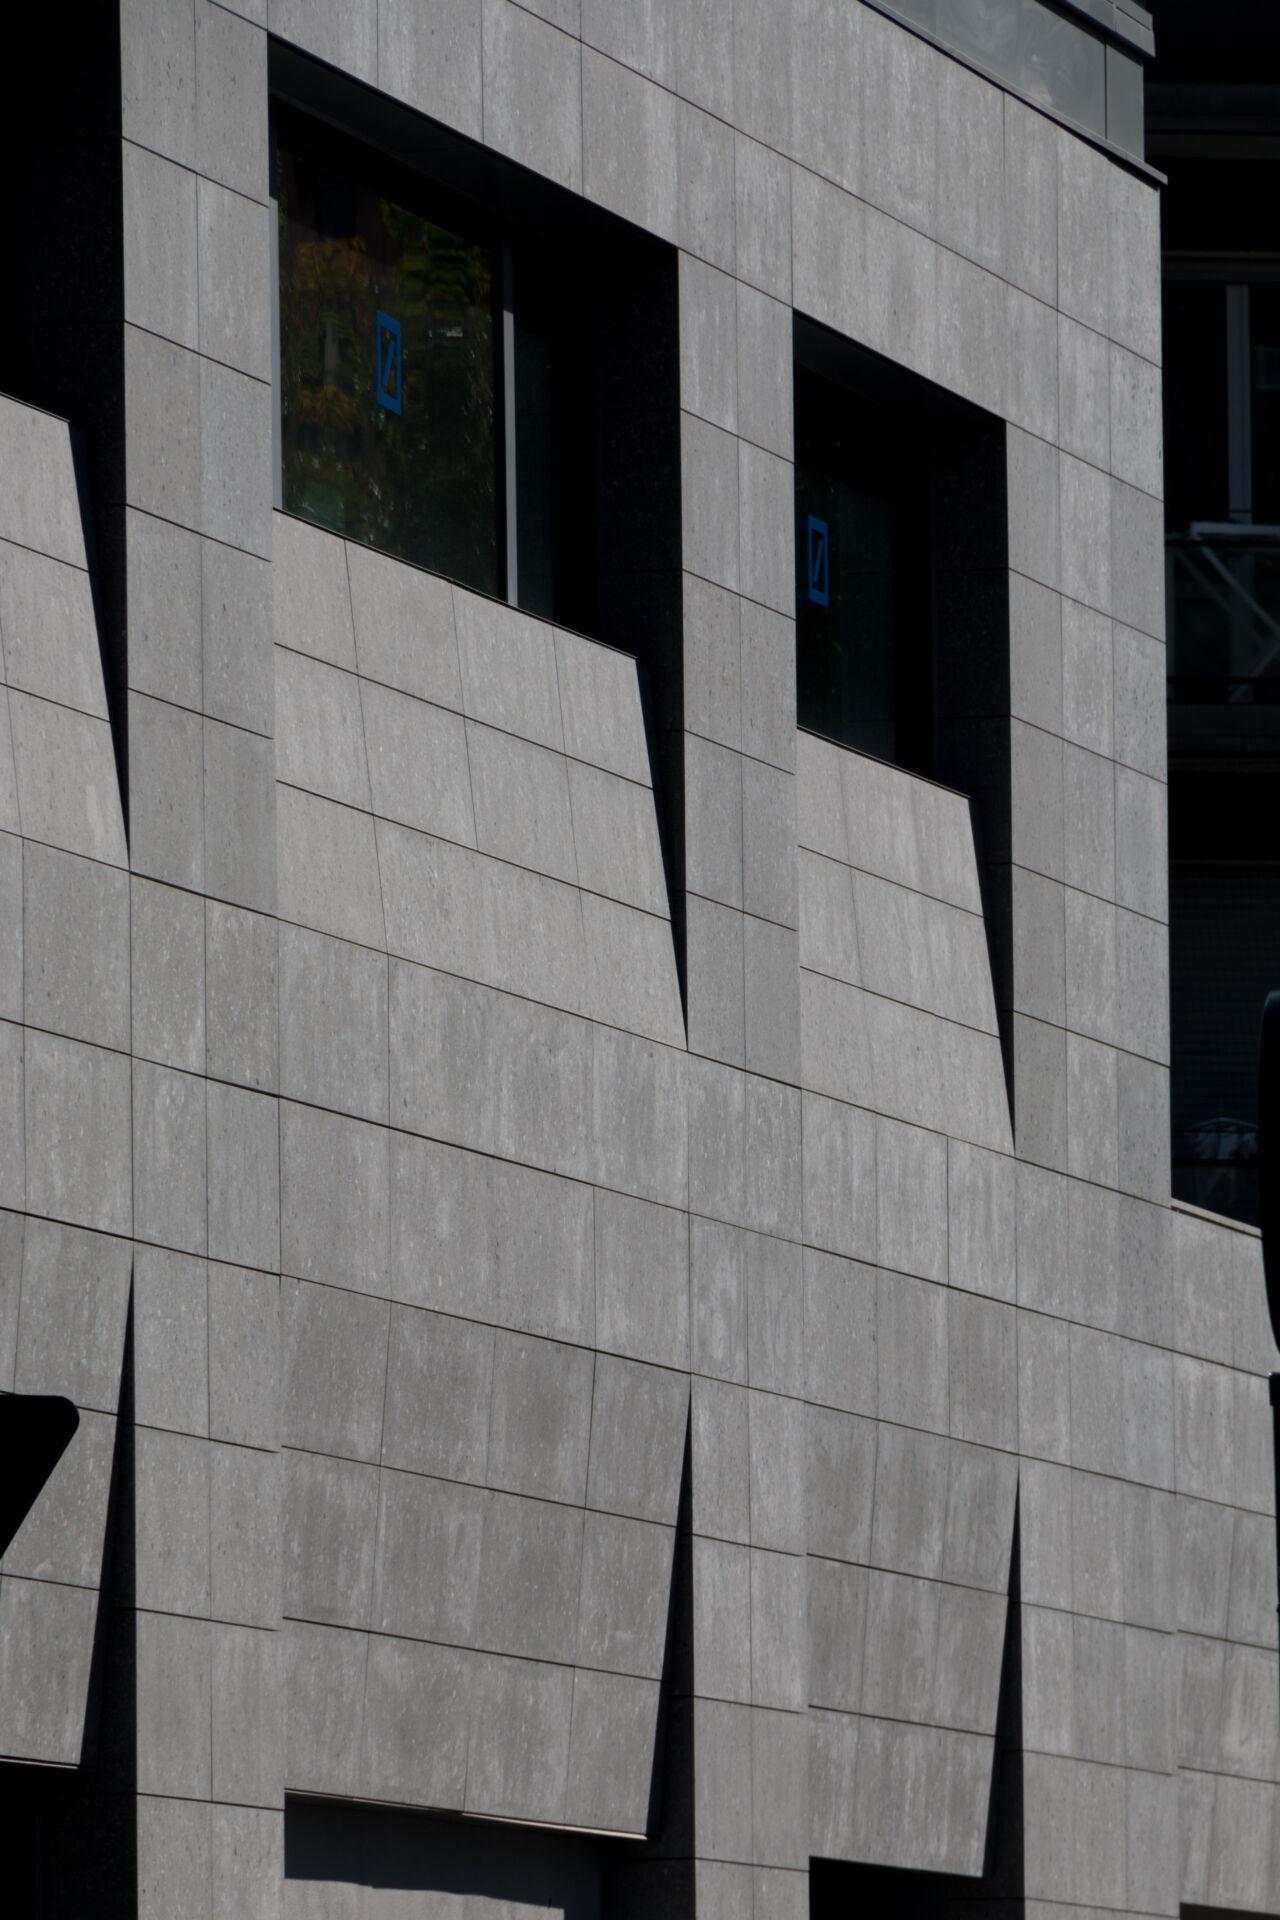 Anchor profile ventilated facade general electric